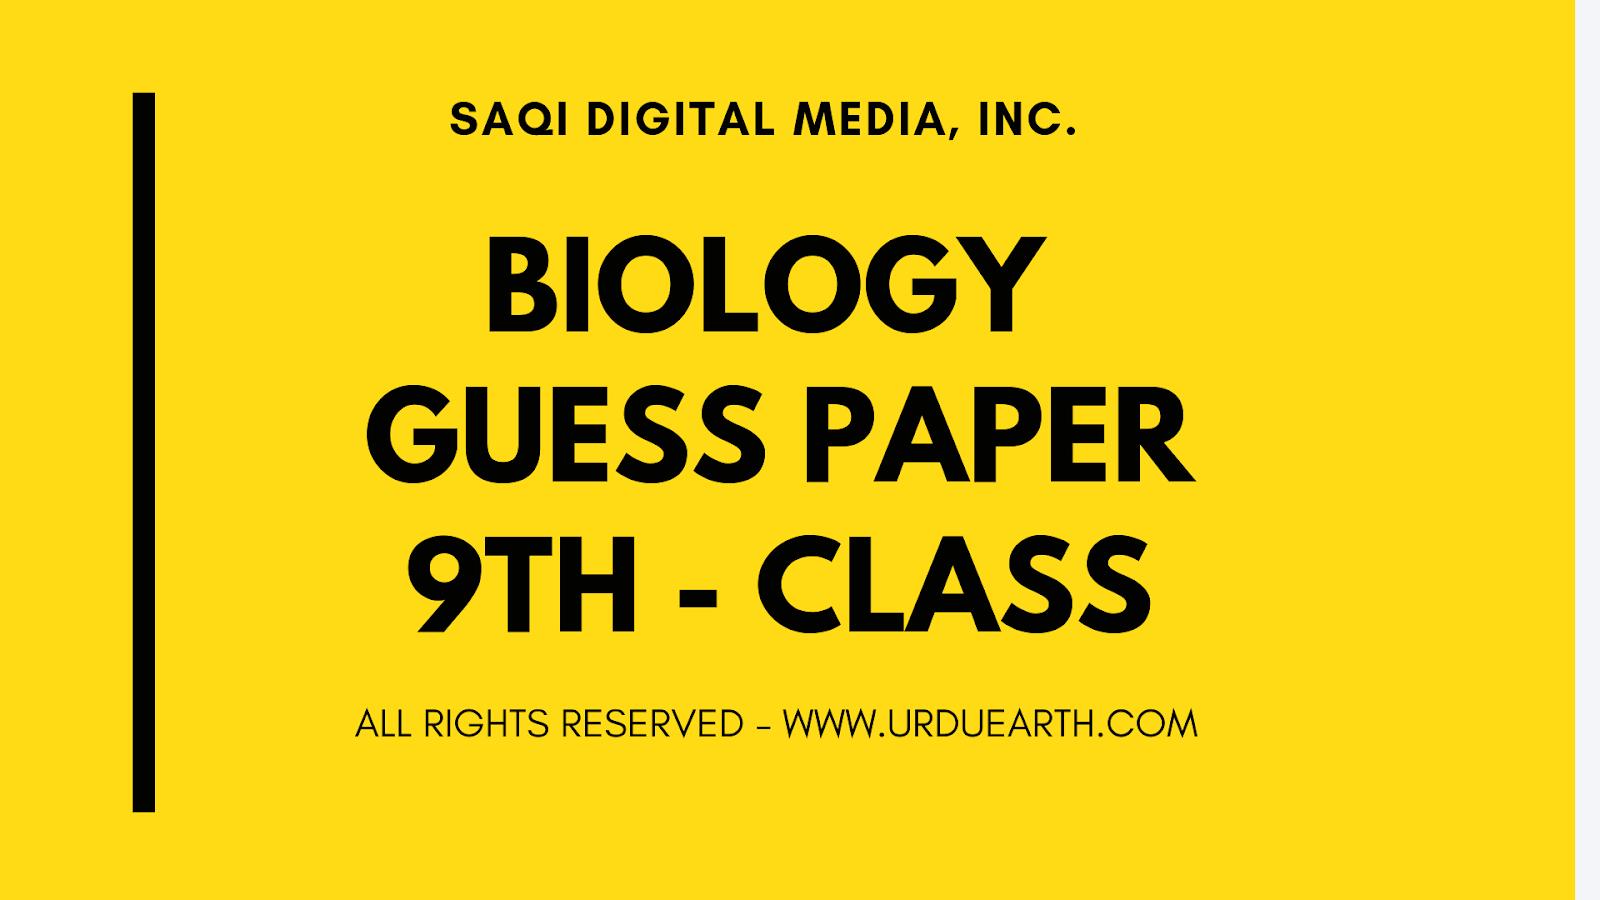 Biology Guess Paper - 9th Class - 2019 - Urdu Earth